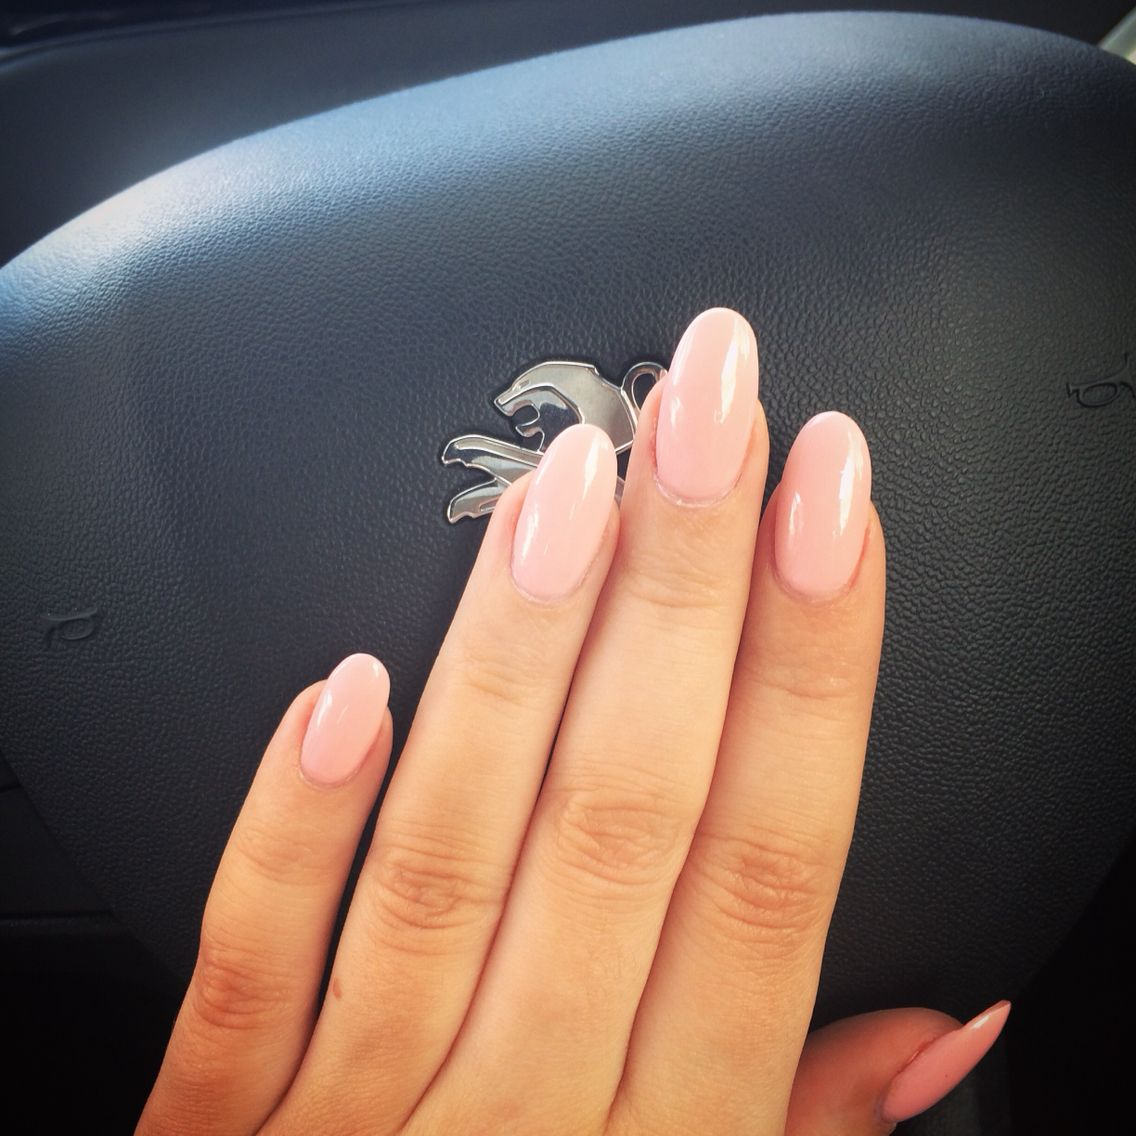 Pale Pink Acrylic Light Pink Acrylic Nails Oval Acrylic Nails Rounded Acrylic Nails